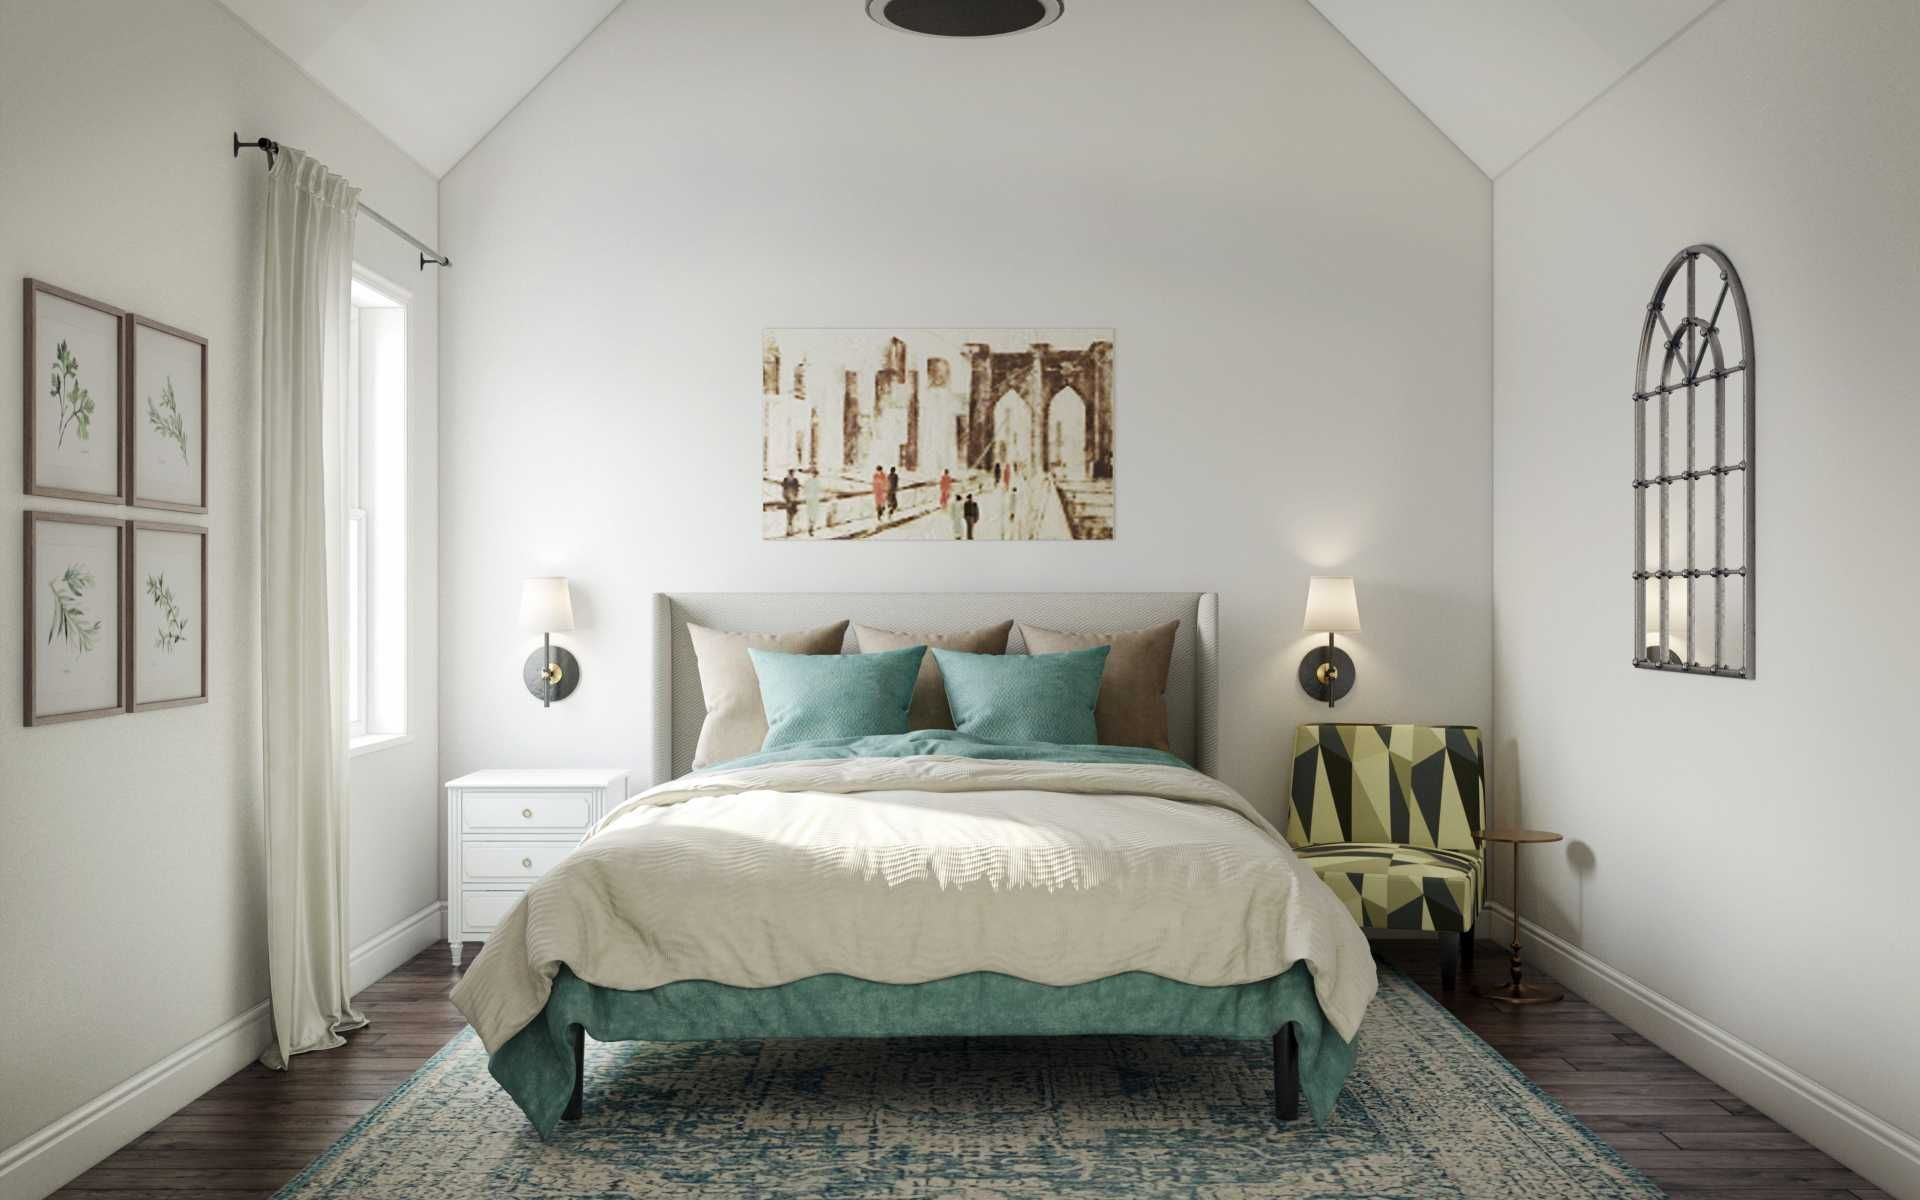 Farmhouse Midcentury Modern Bedroom Design By Havenly Interior Designer Kyla Interior Design Modern Bedroom Design Modern Bedroom